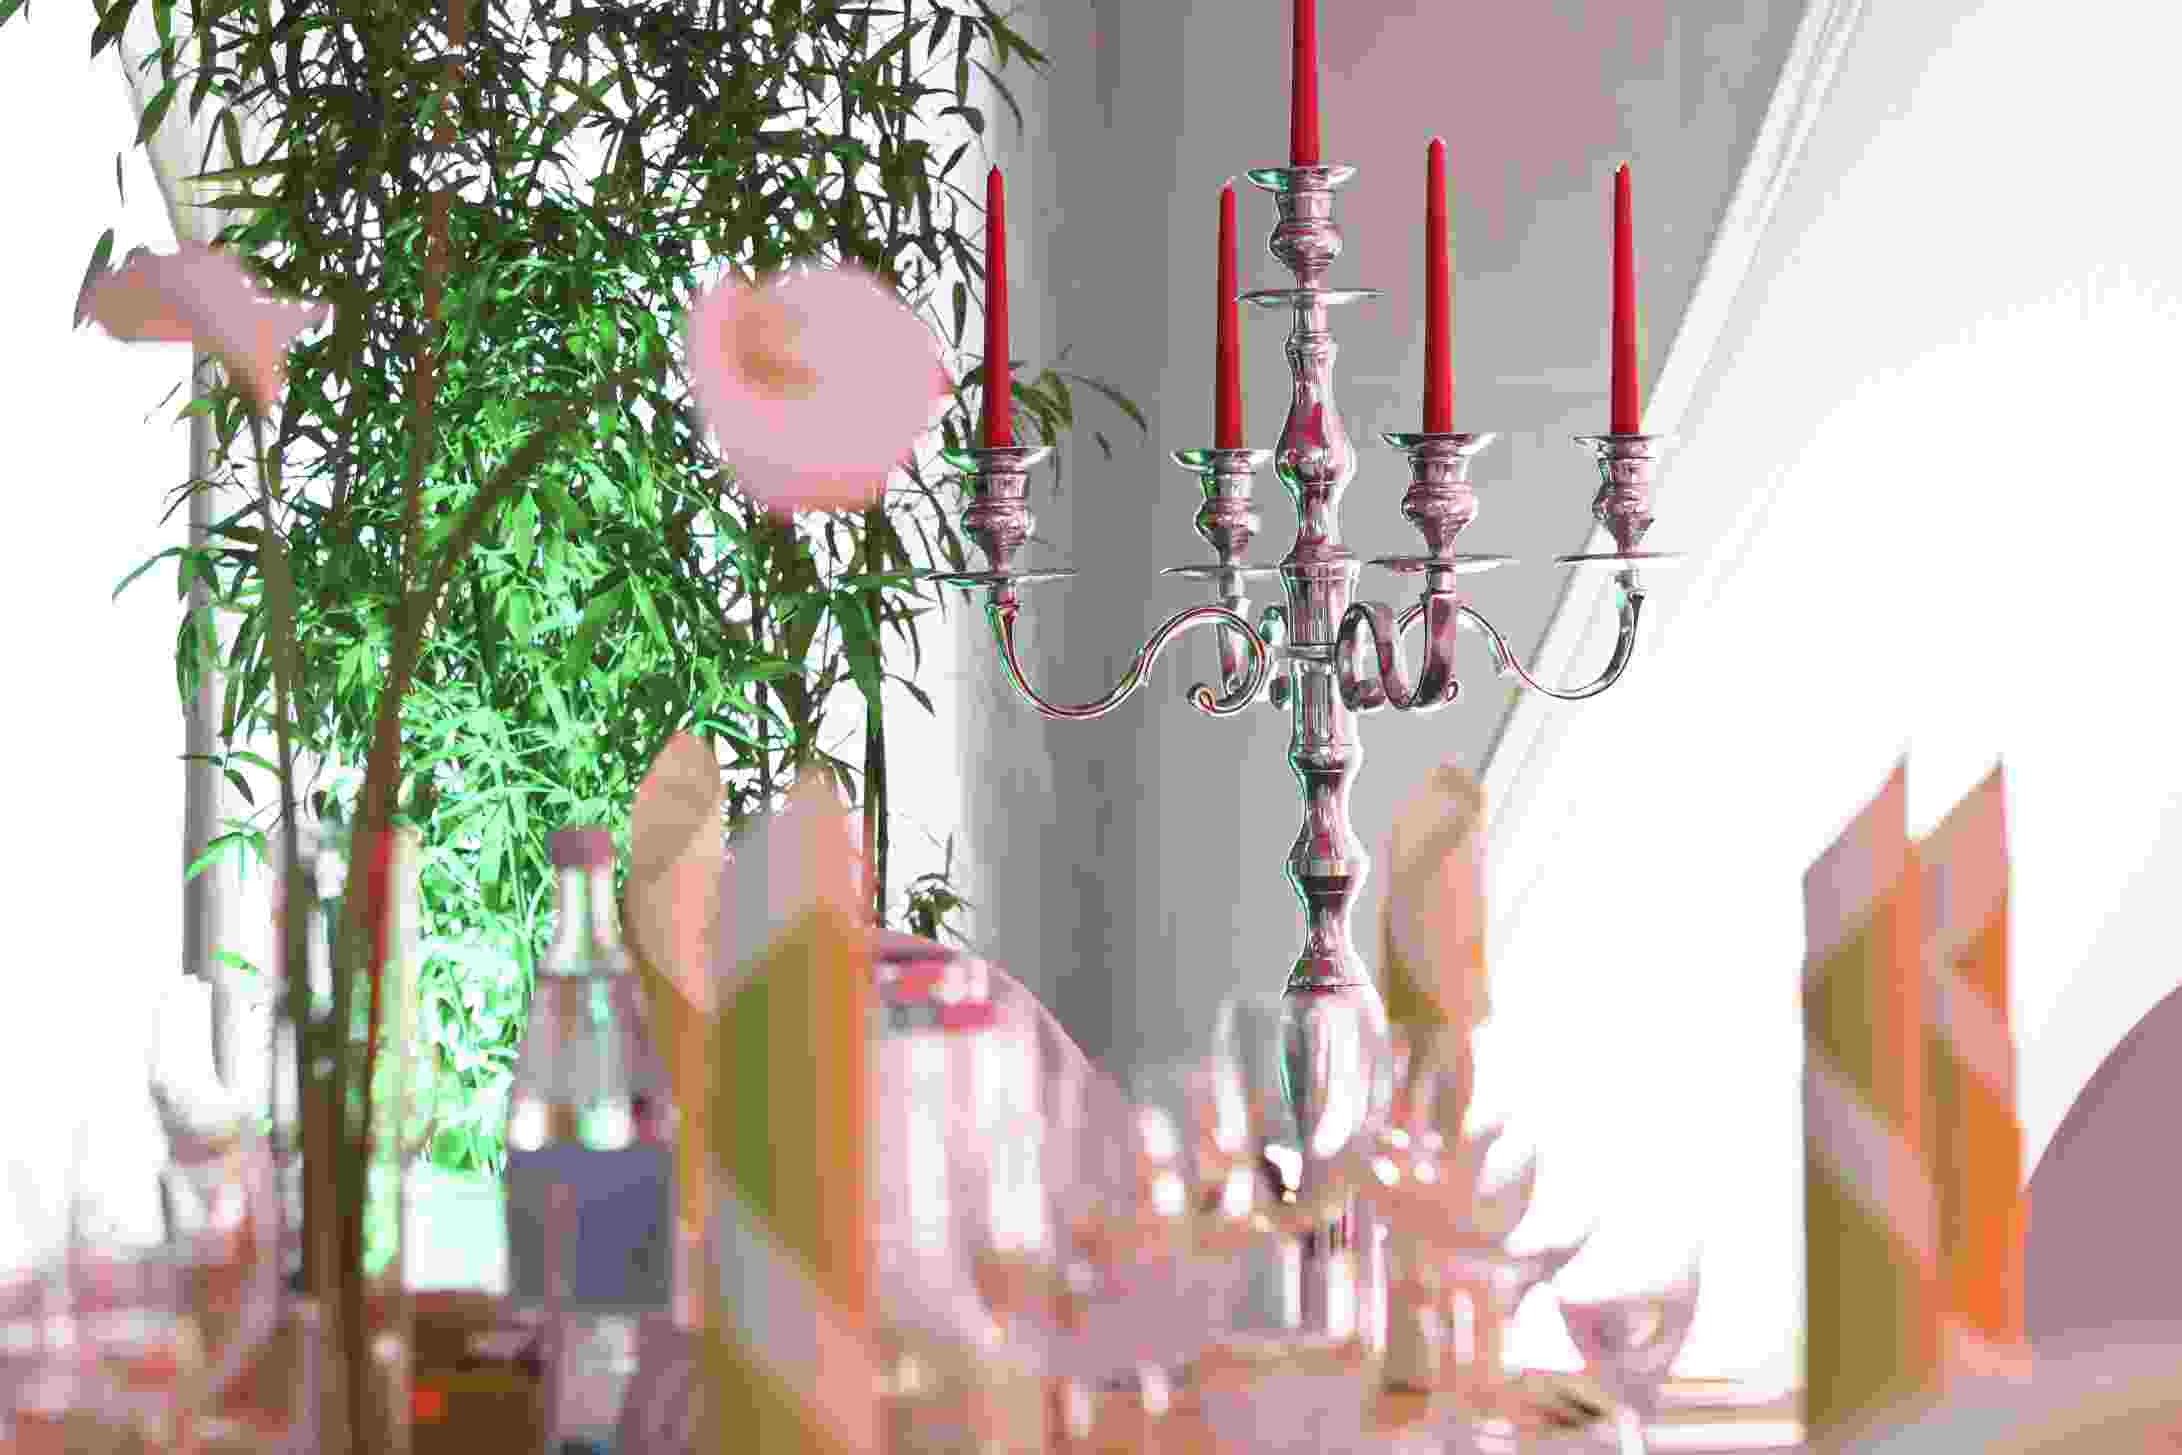 Rak Gernsheim rak gernsheim 2011 09 02 013 landgasthaus partyservice böß